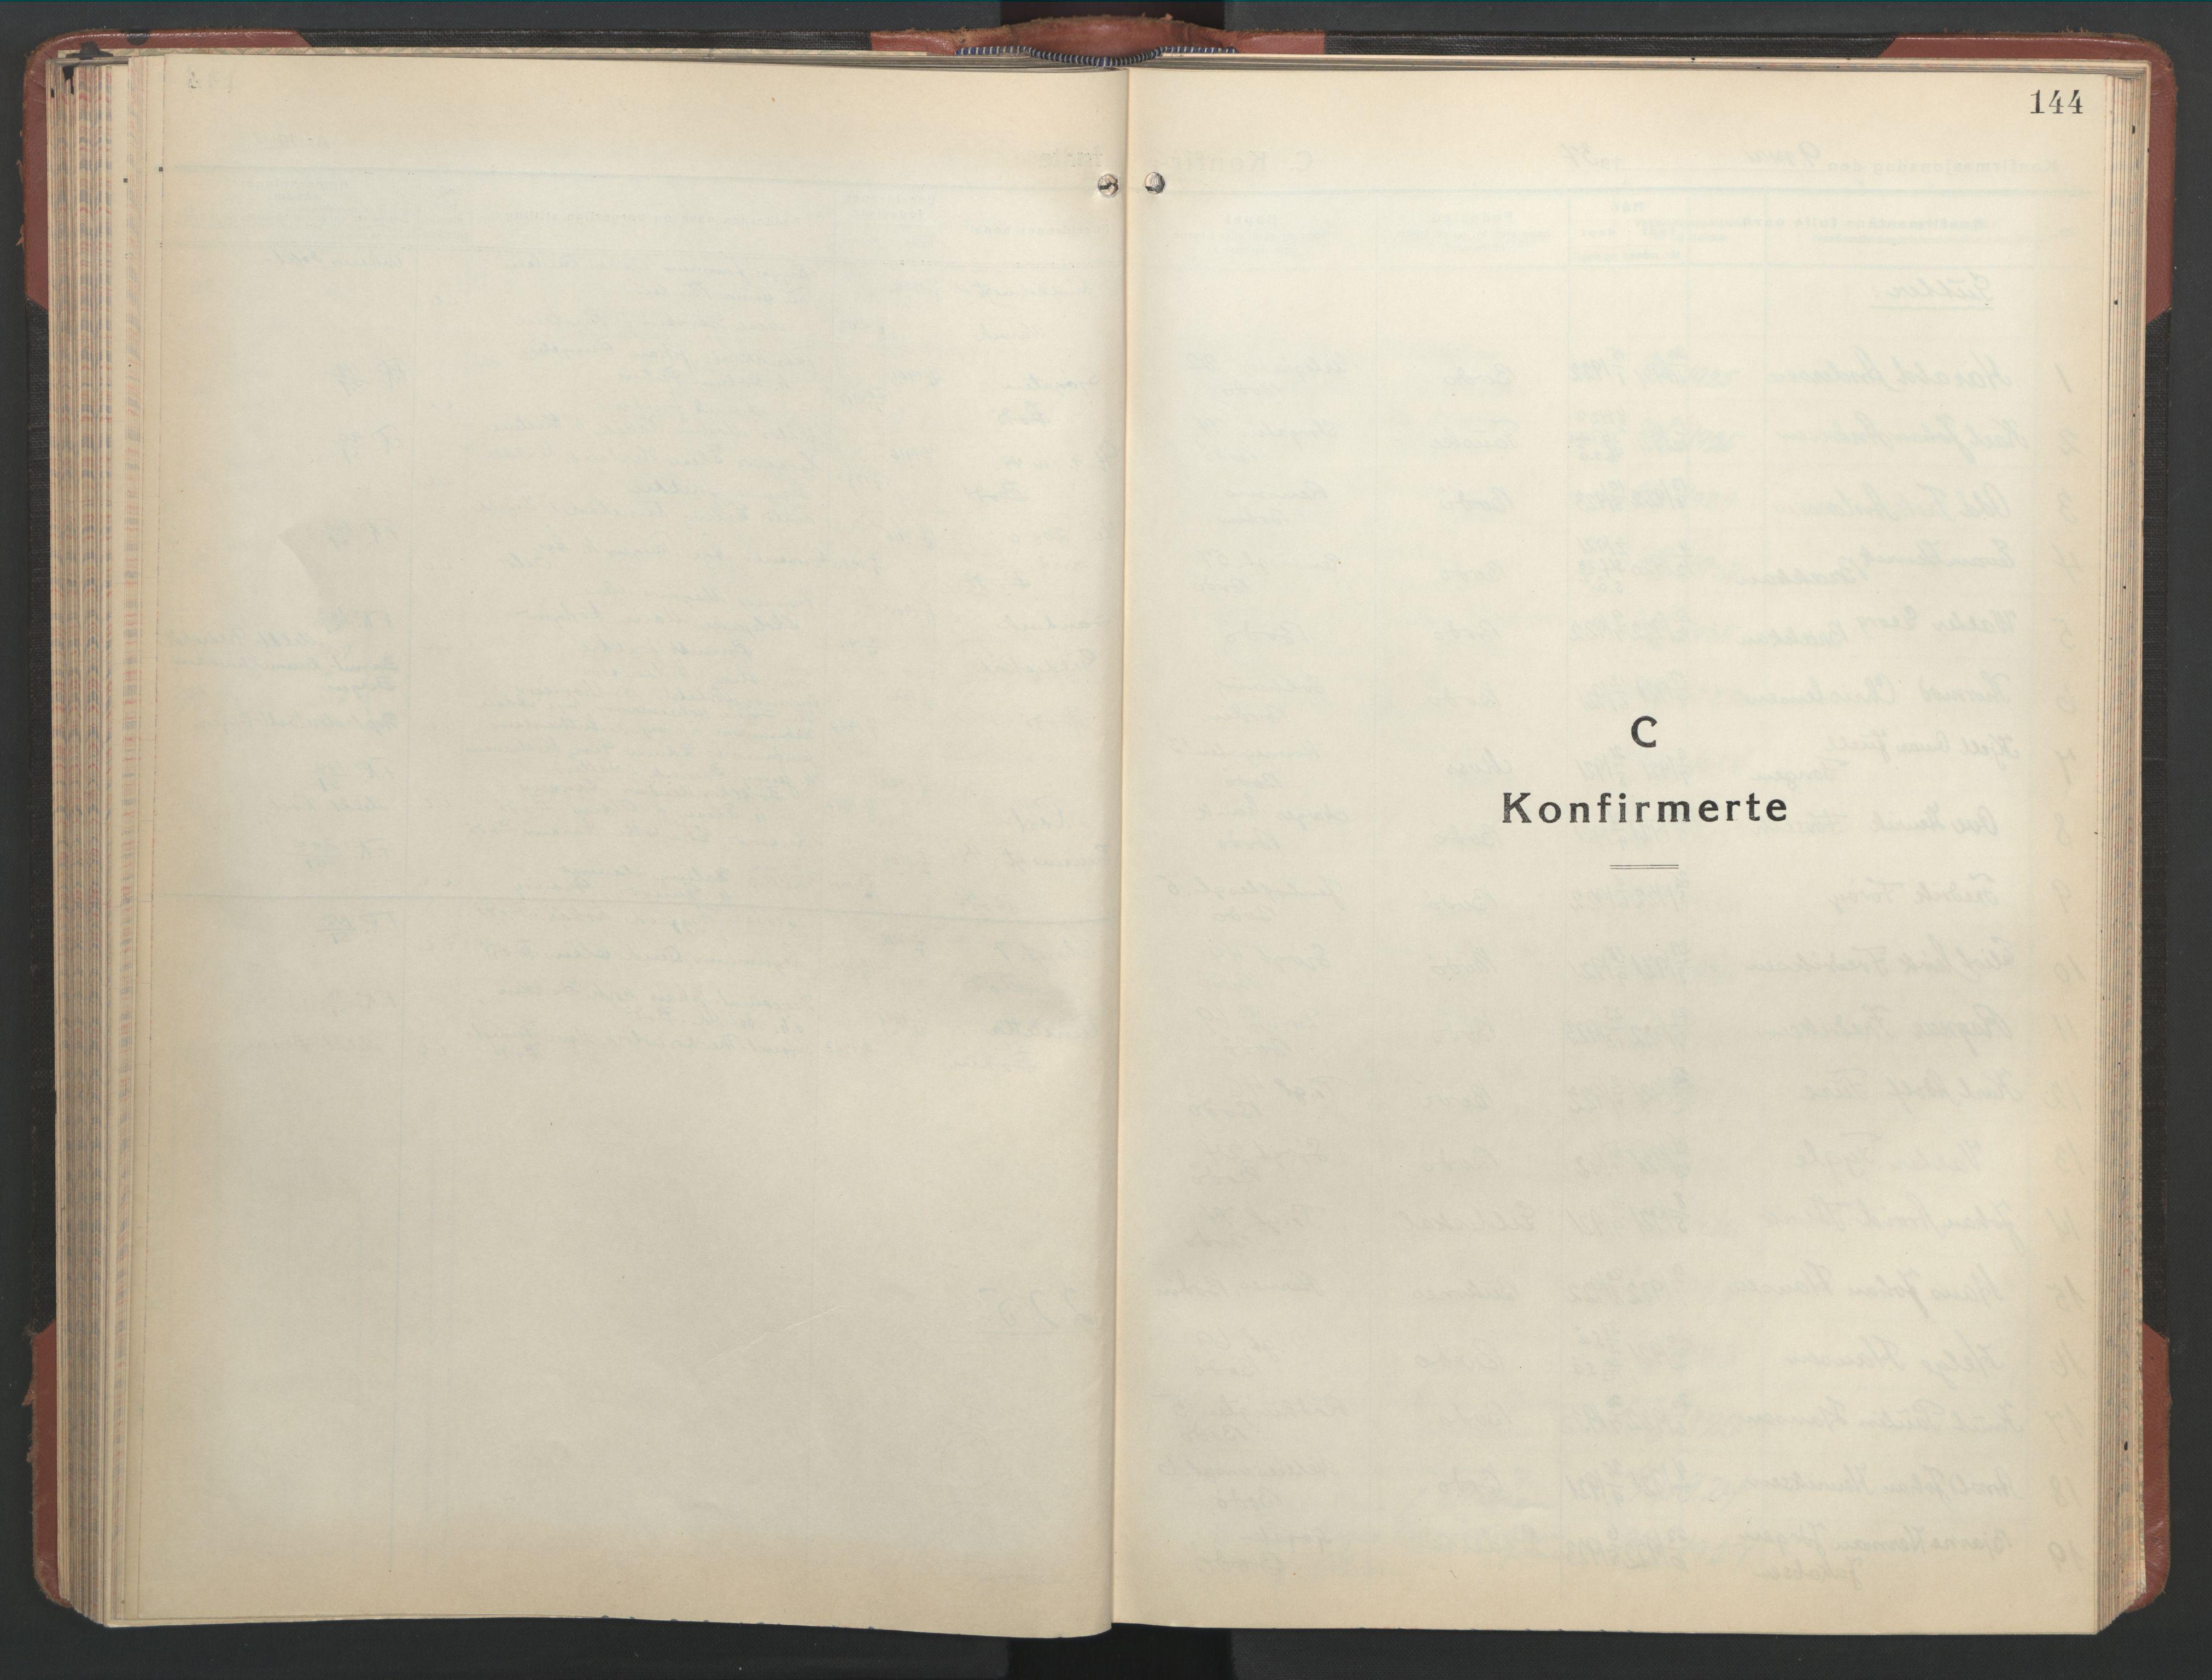 SAT, Ministerialprotokoller, klokkerbøker og fødselsregistre - Nordland, 801/L0039: Klokkerbok nr. 801C14, 1937-1951, s. 144